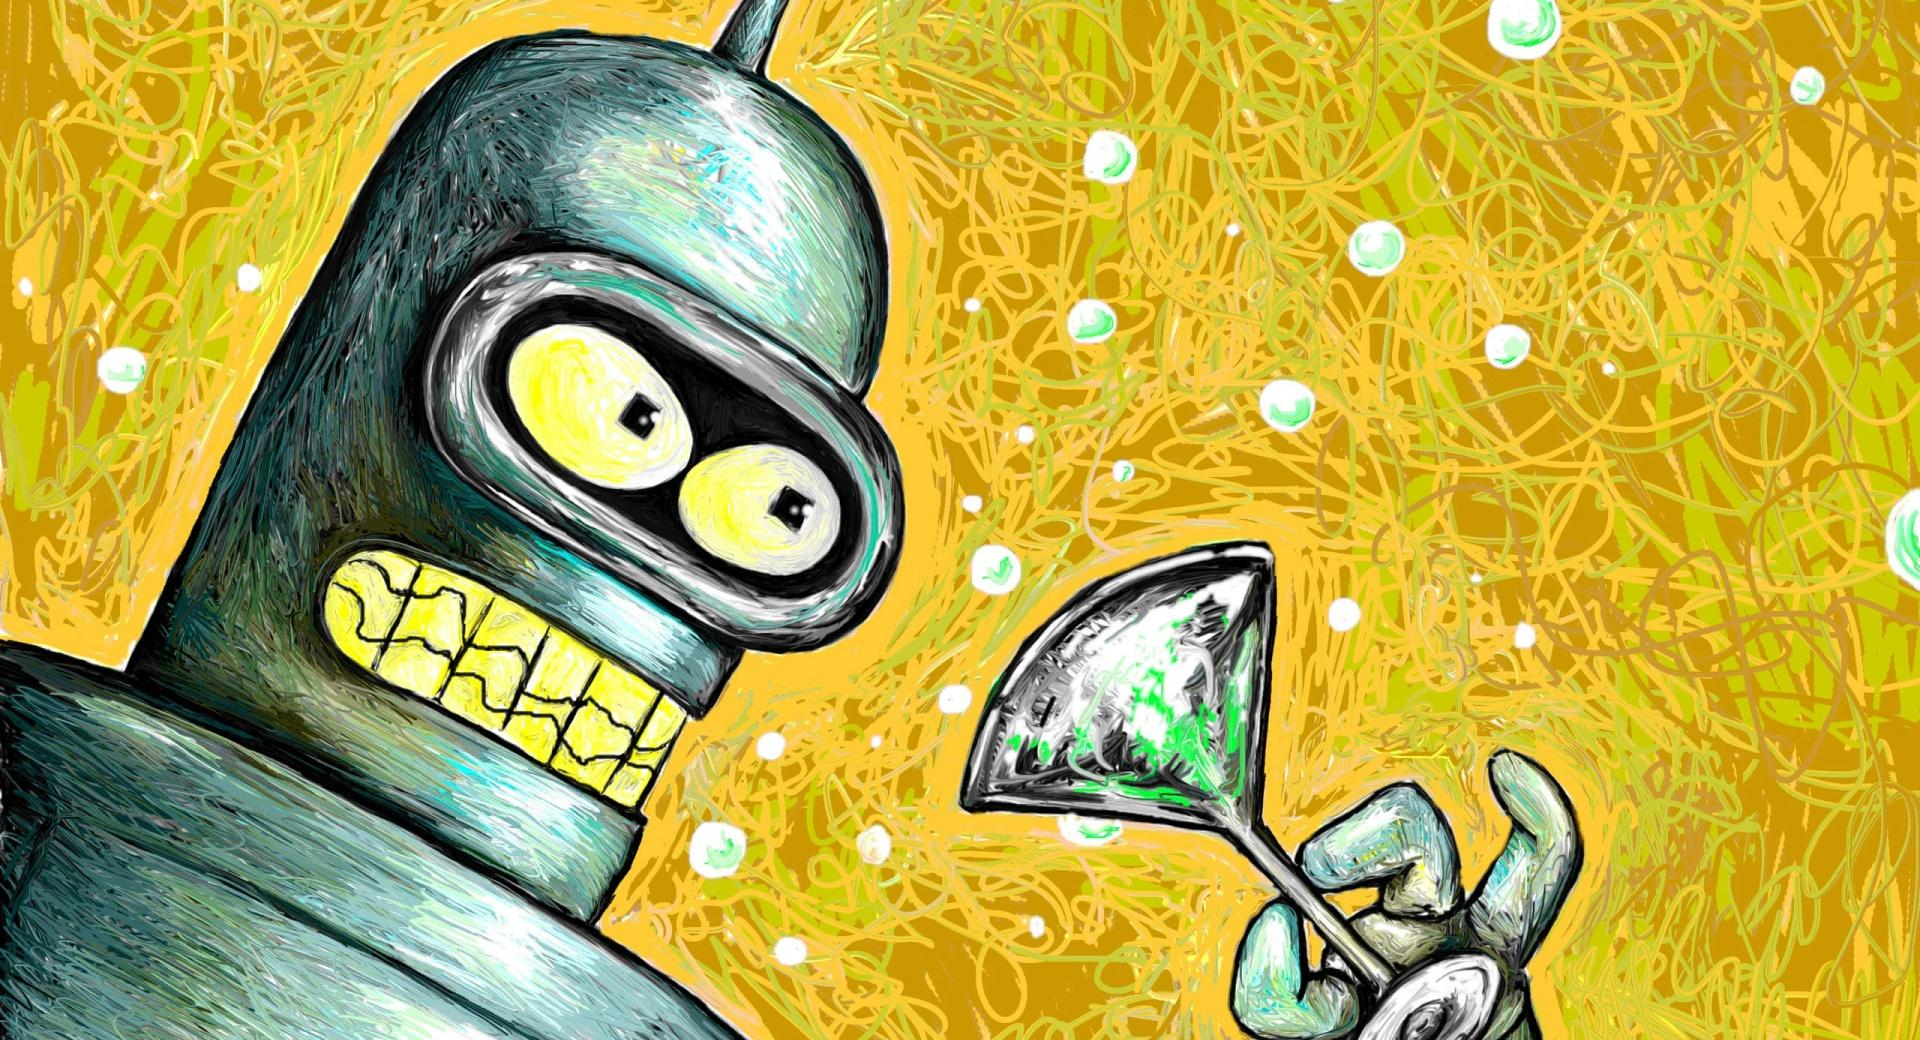 Bender Futurama wallpapers HD quality